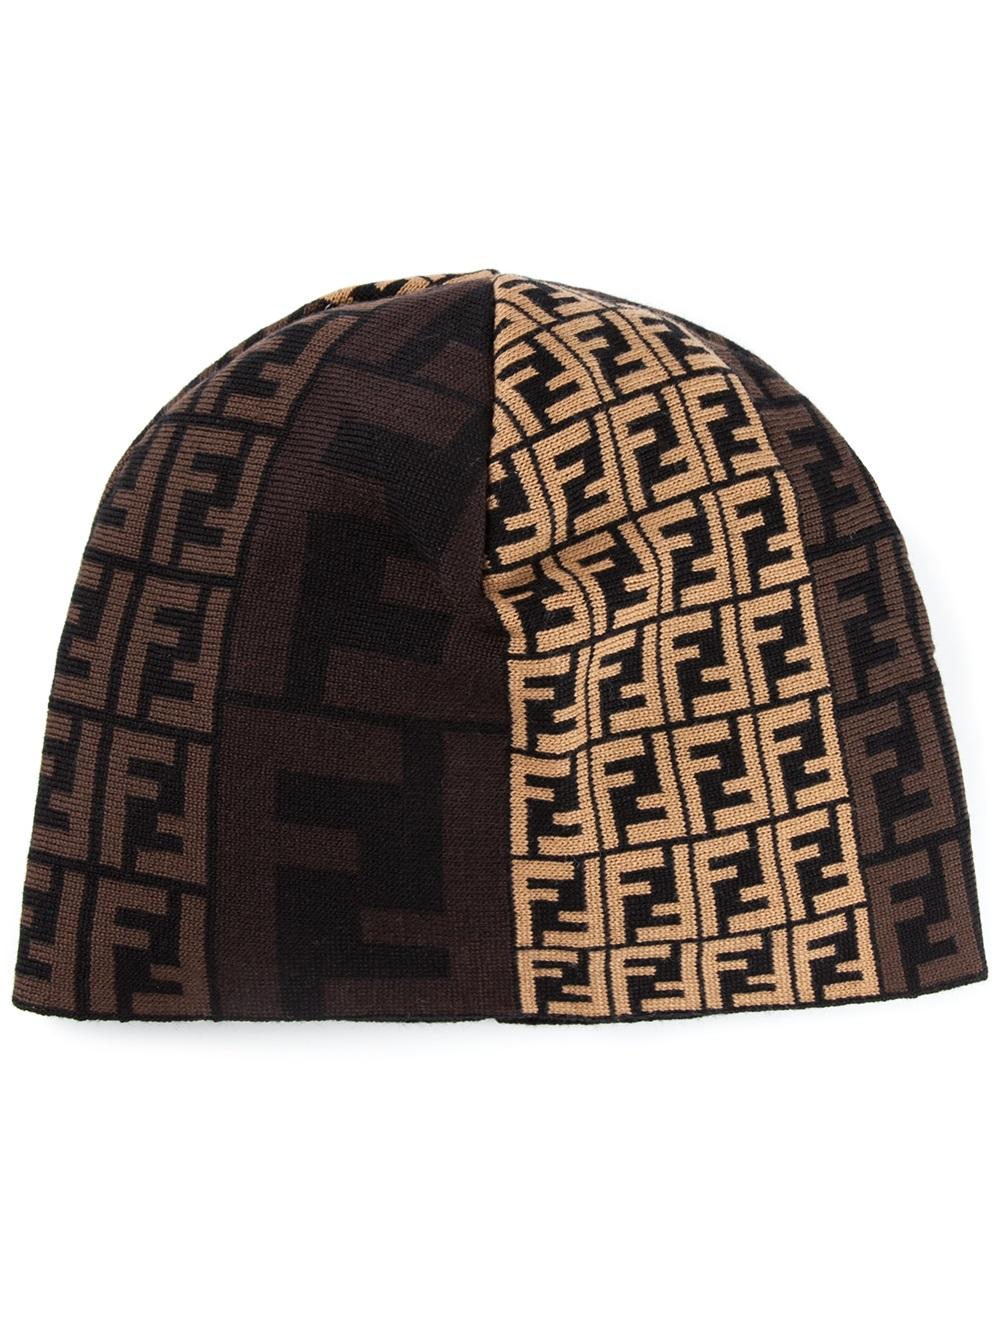 600de7a9931 Fendi Monogram Beanie Hat in Brown for Men - Lyst